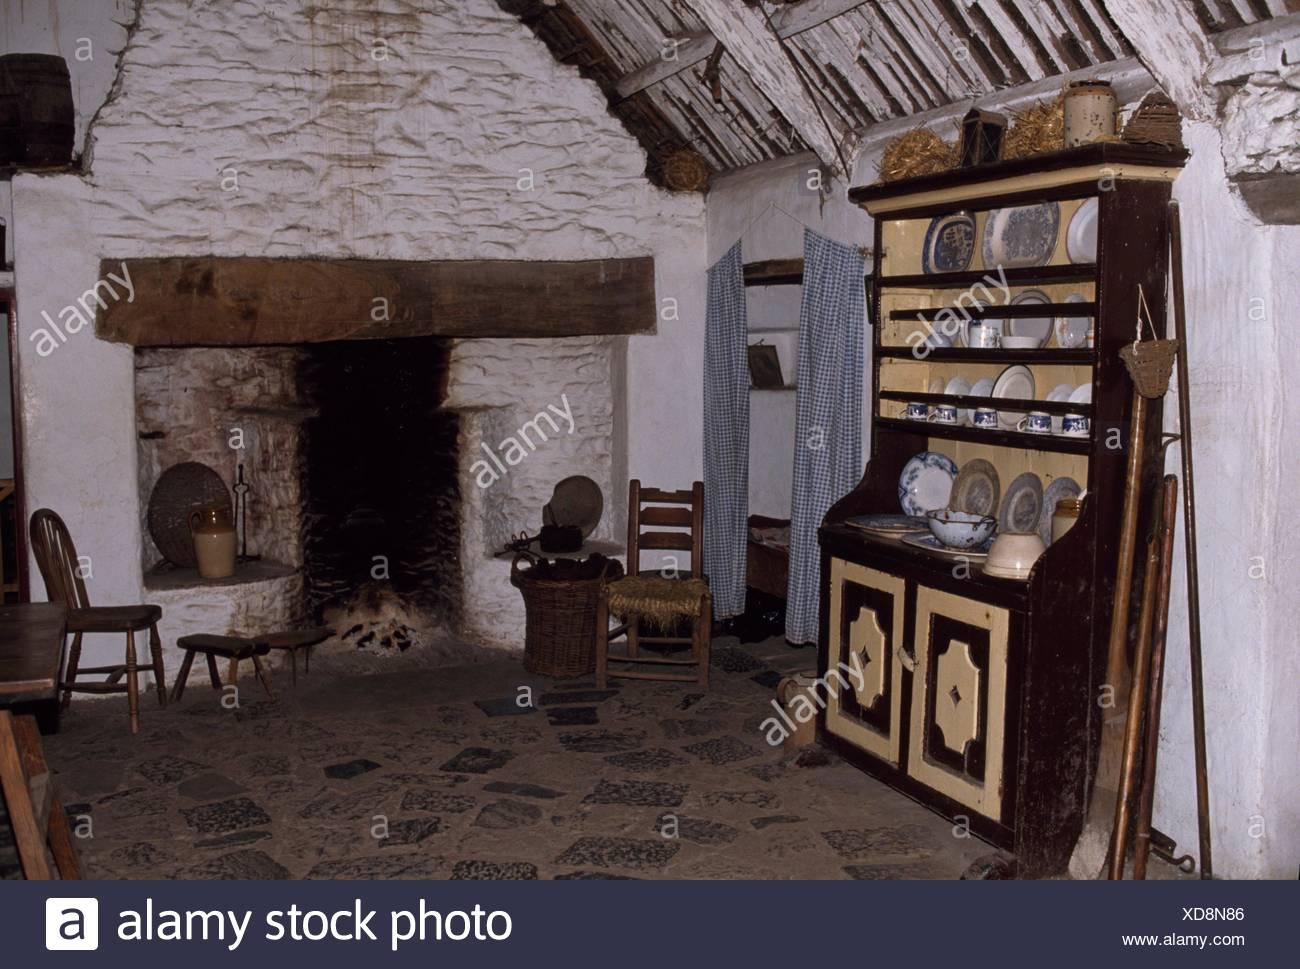 Bunratty Folk Park, Co Clare, Ireland; Interior Of A Home At A Folk Park - Stock Image